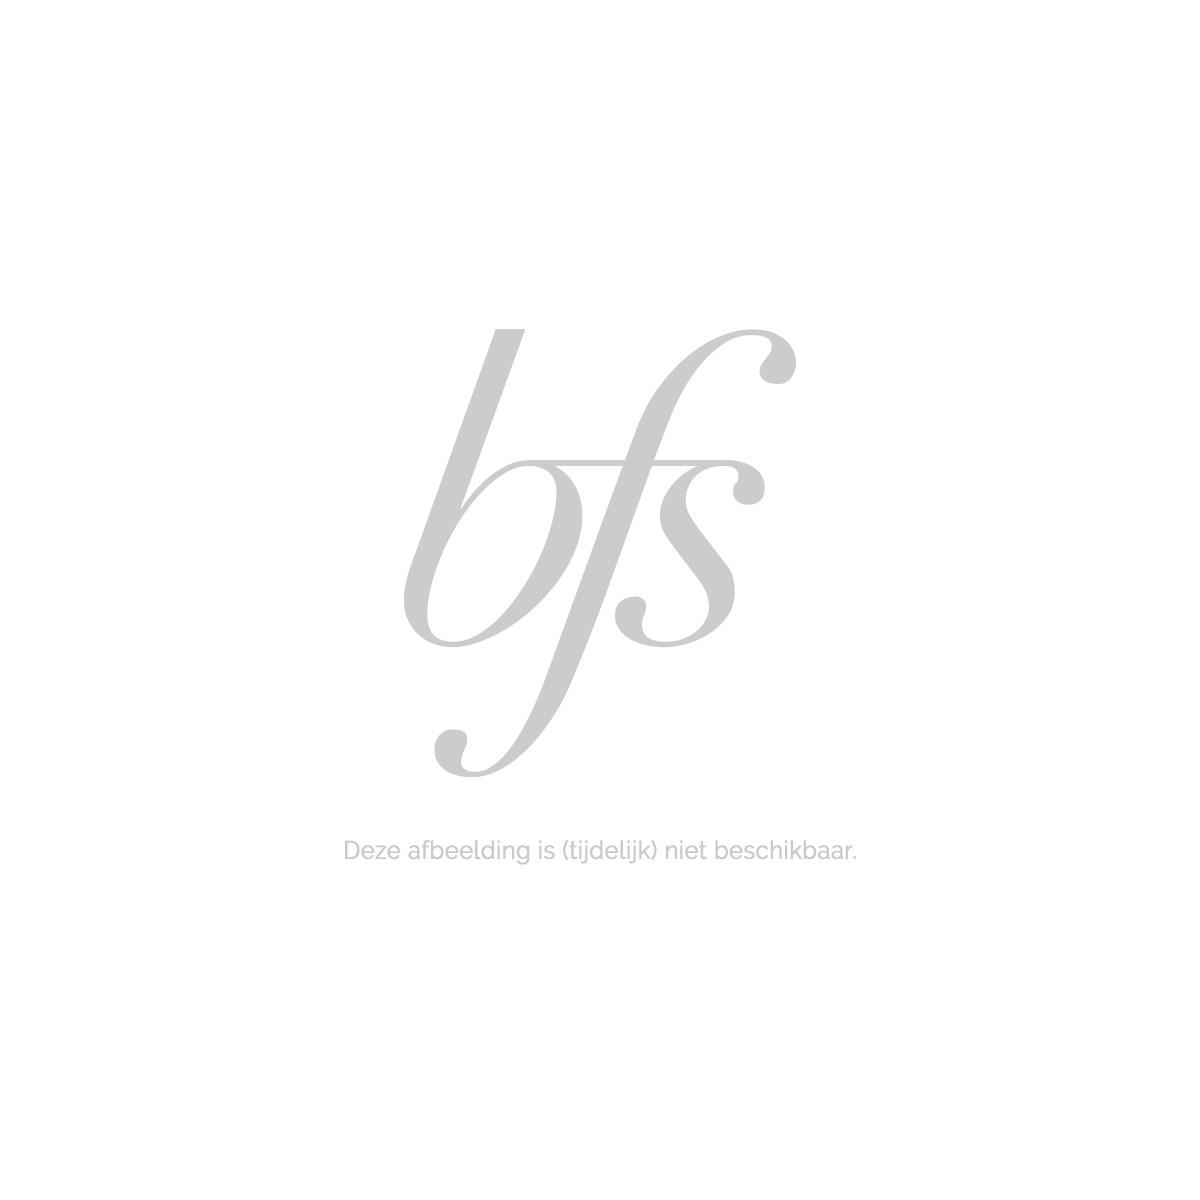 Michael Kors Wonderlust Eau de Parfum online kaufen bei